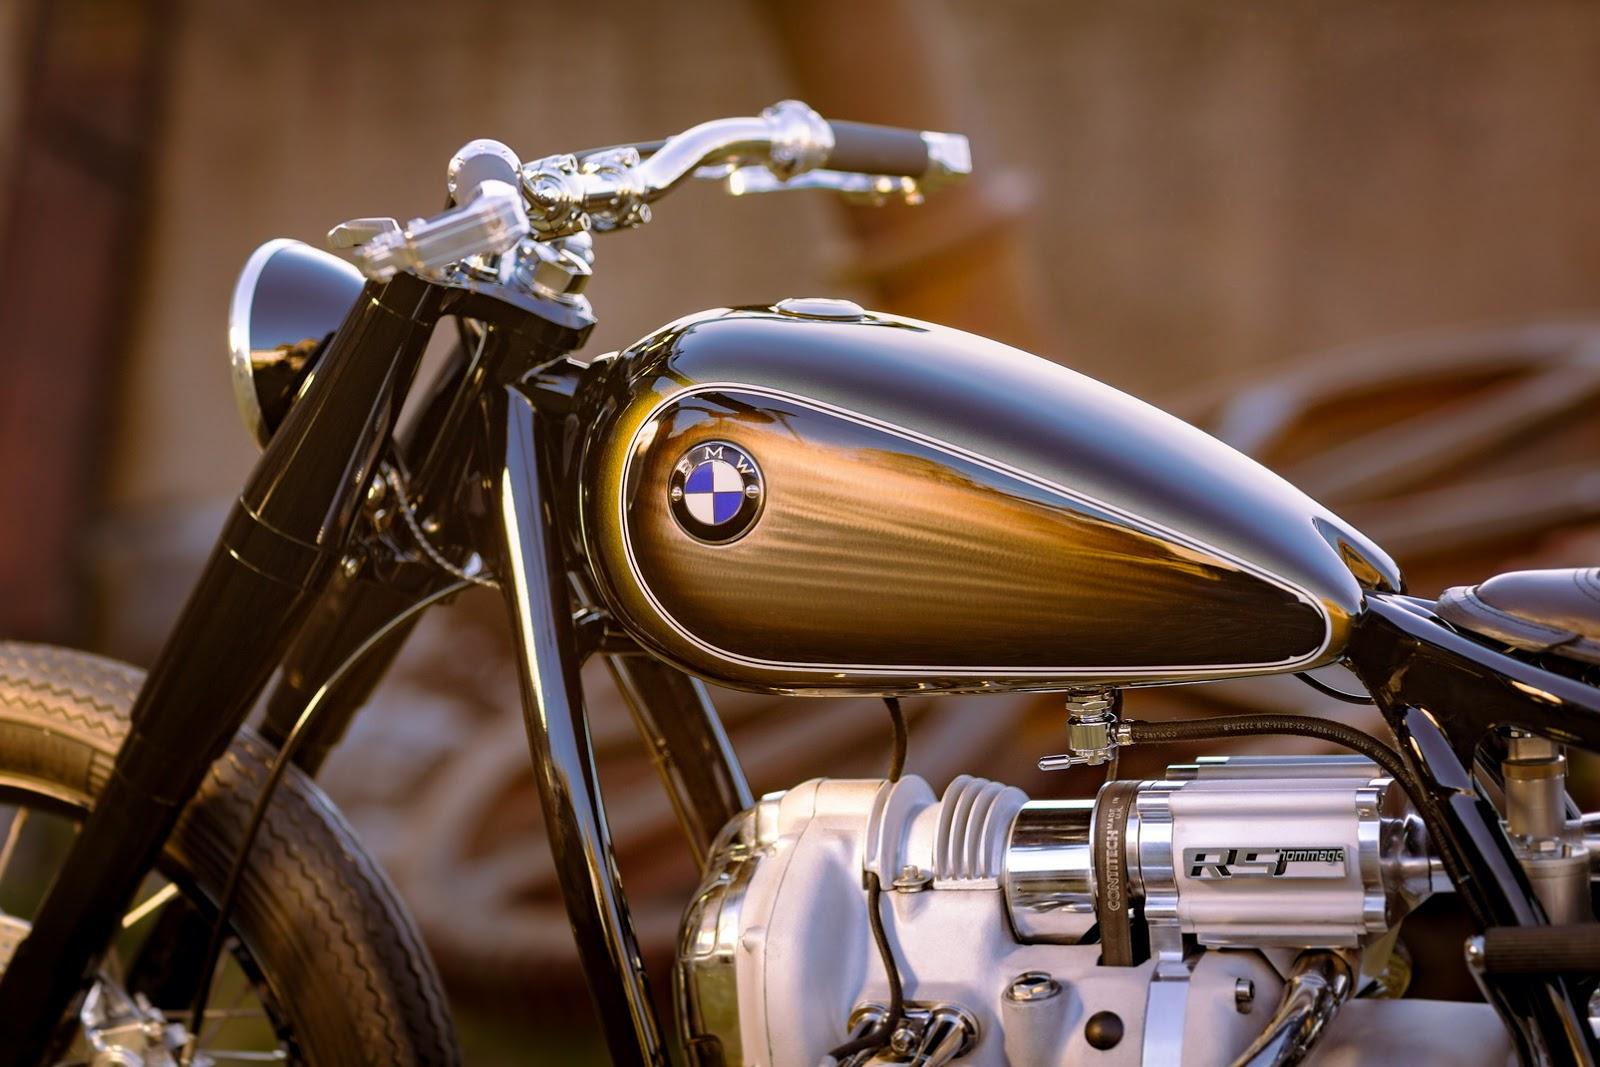 bmw-r5-hommage-bike-villa-deste-28-autonovosti.me-7